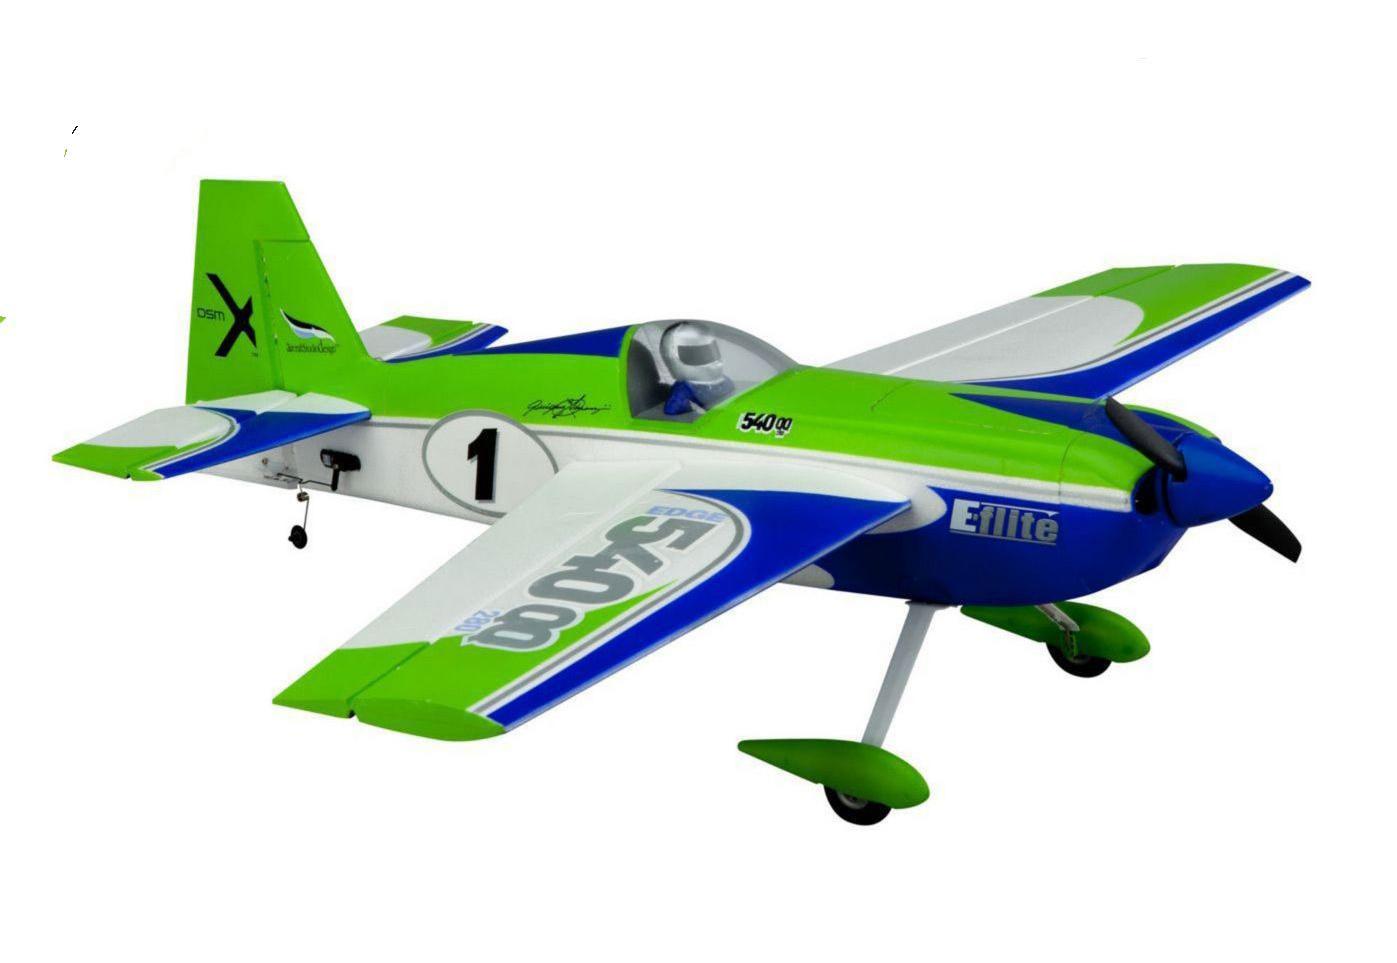 E-flite Радиоуправляемый Самолет - Edge 540QQ 280 660мм BNF Basic